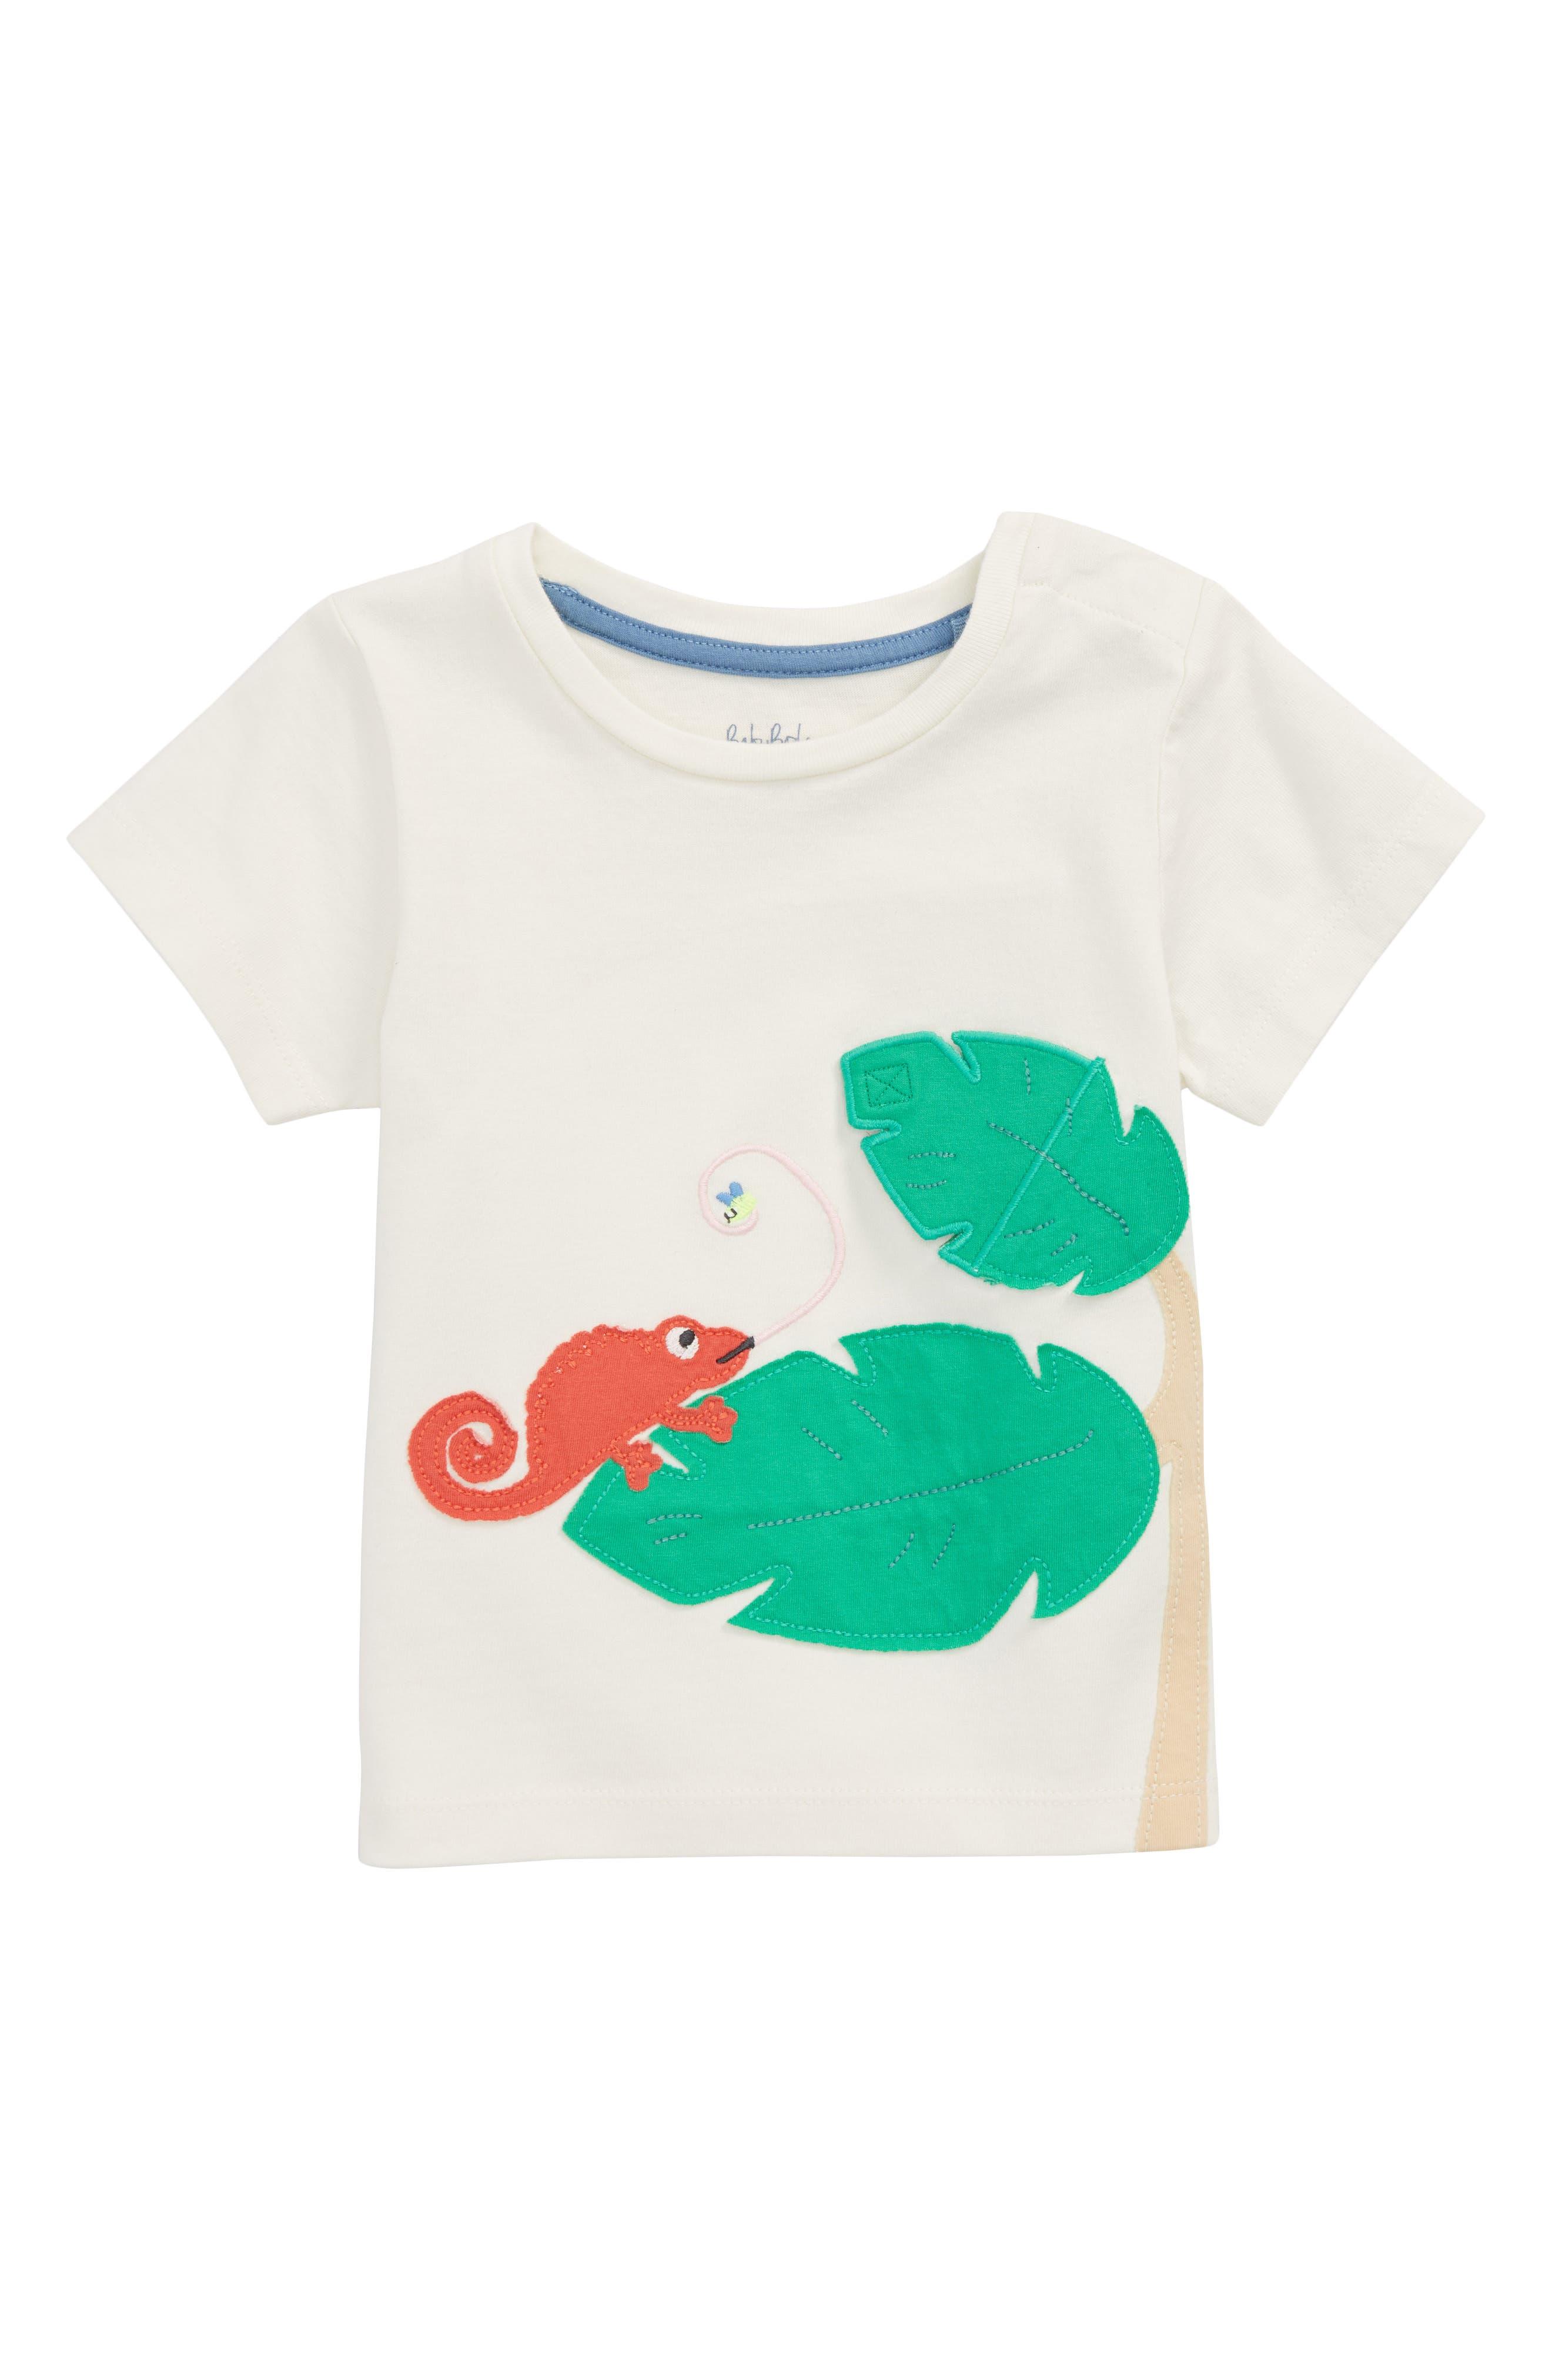 Peekaboo T-Shirt,                         Main,                         color,